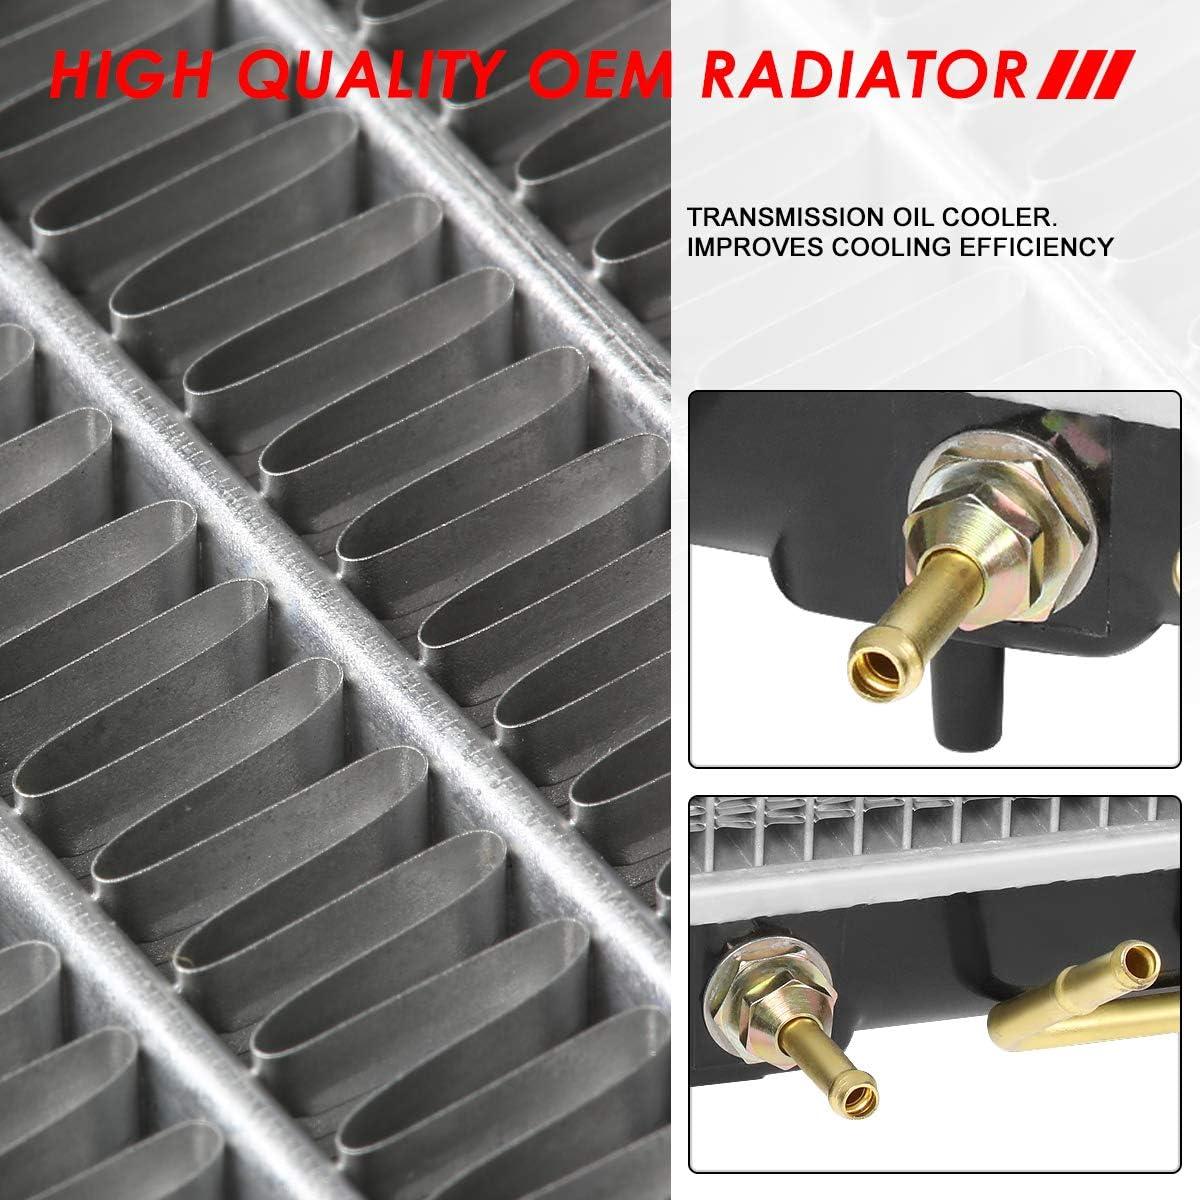 FOR 04-12 MITSUBISHI GALANT L4 V6 STYLE FULL ALUMINUM CORE COOLING RADIATOR 2723